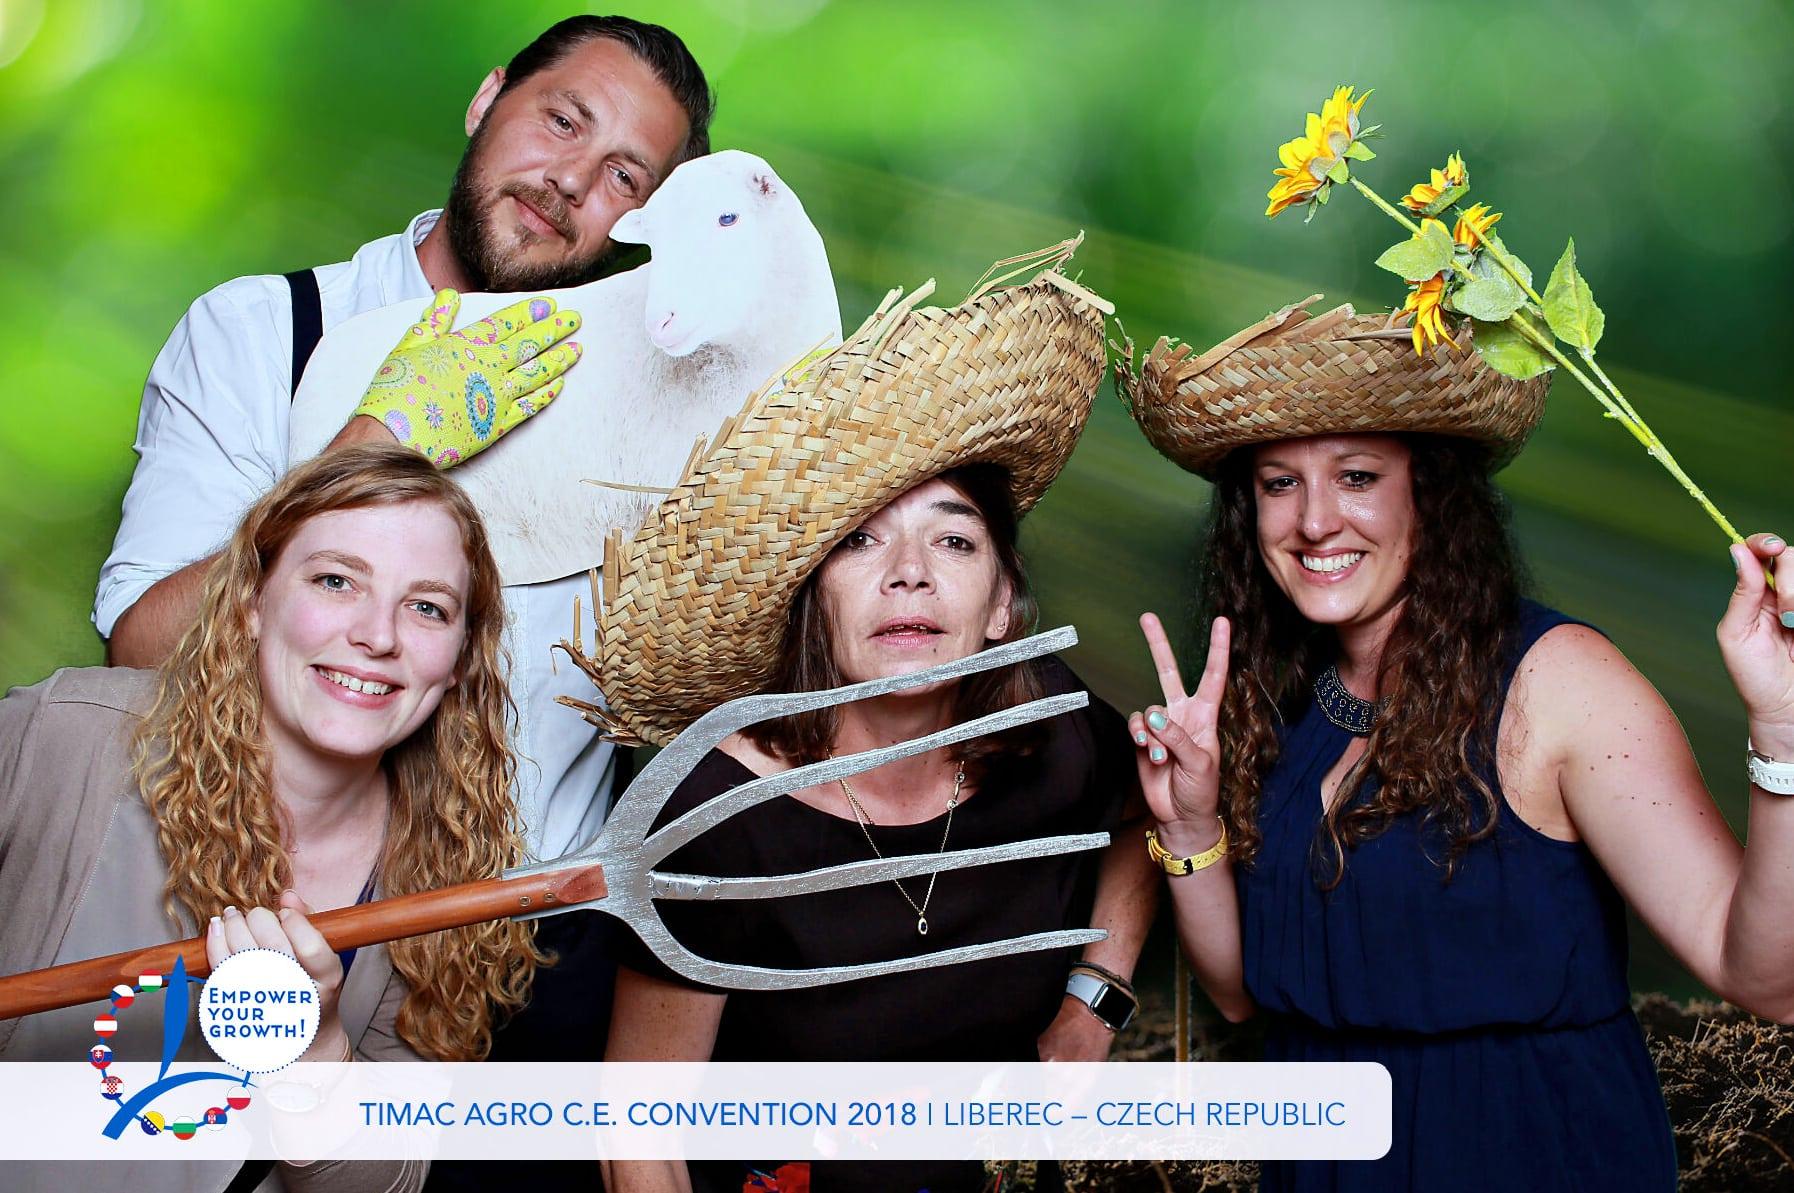 fotokoutek-liberec-timac-agro-c-e-convention-12-6-2018-435089